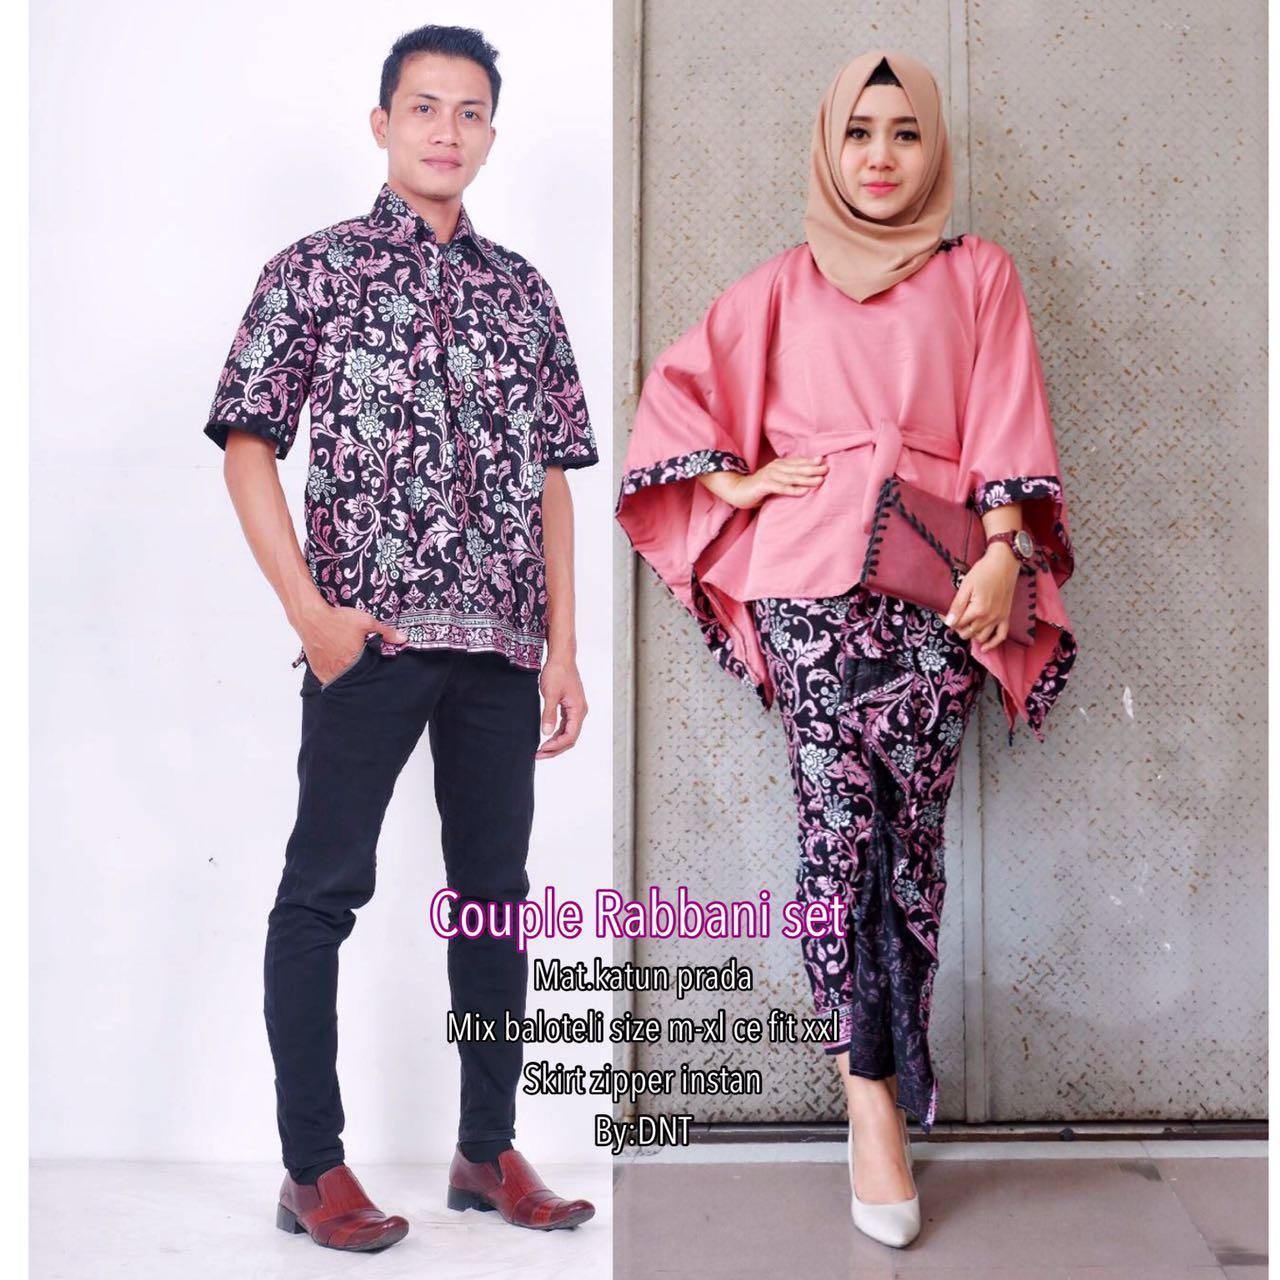 Baju Batik Couple/ Batik Sarimbit / Baju Batik Kondangan / Batik Couple / Hem Batik / Batik Pekalongan / Batik Murah / Batik Couple Murah / Setelan Batik Couple